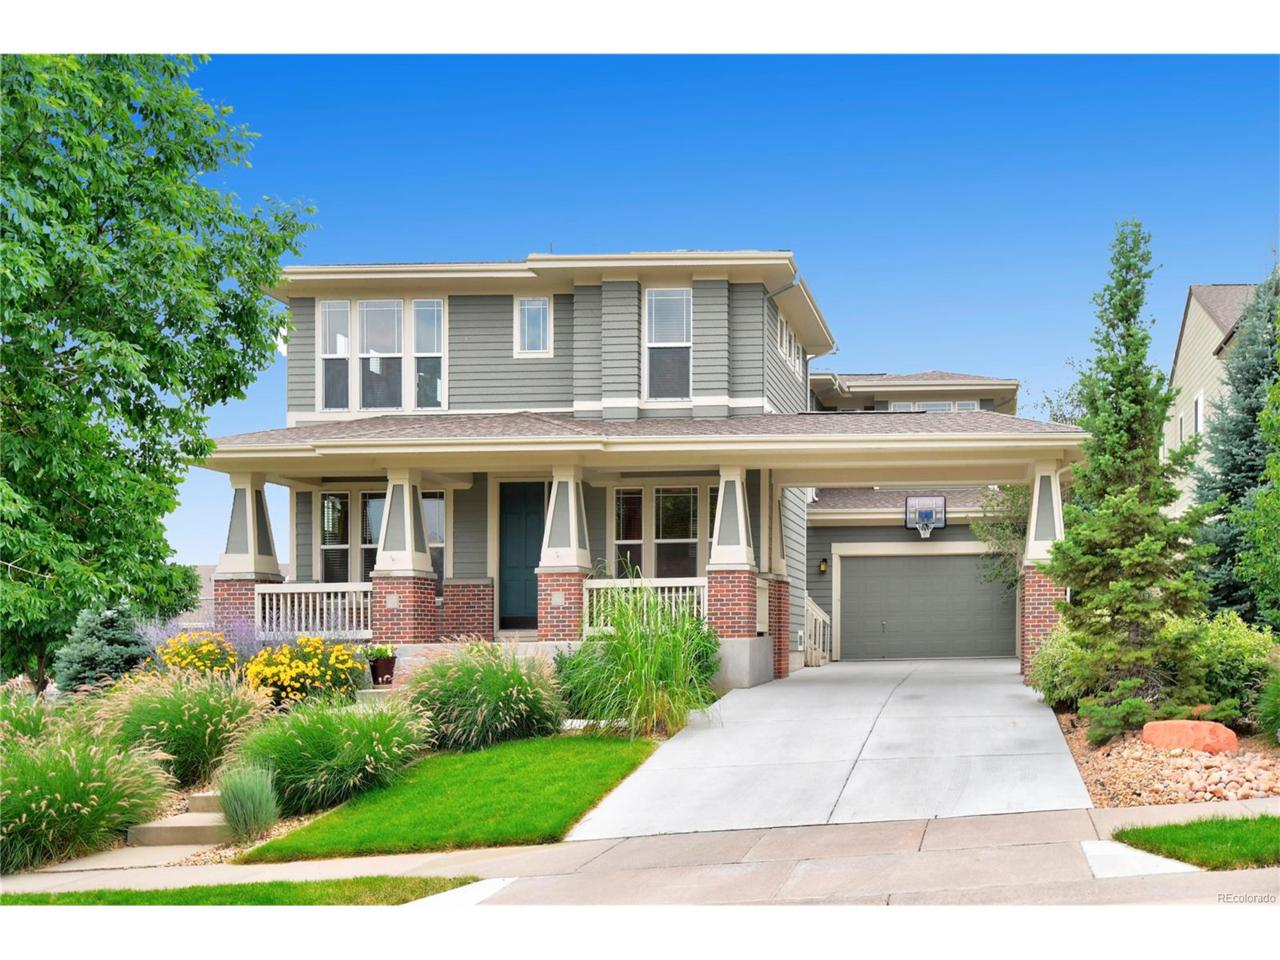 17502 W 60th Lane, Arvada, CO 80403 (MLS #2426098) :: 8z Real Estate